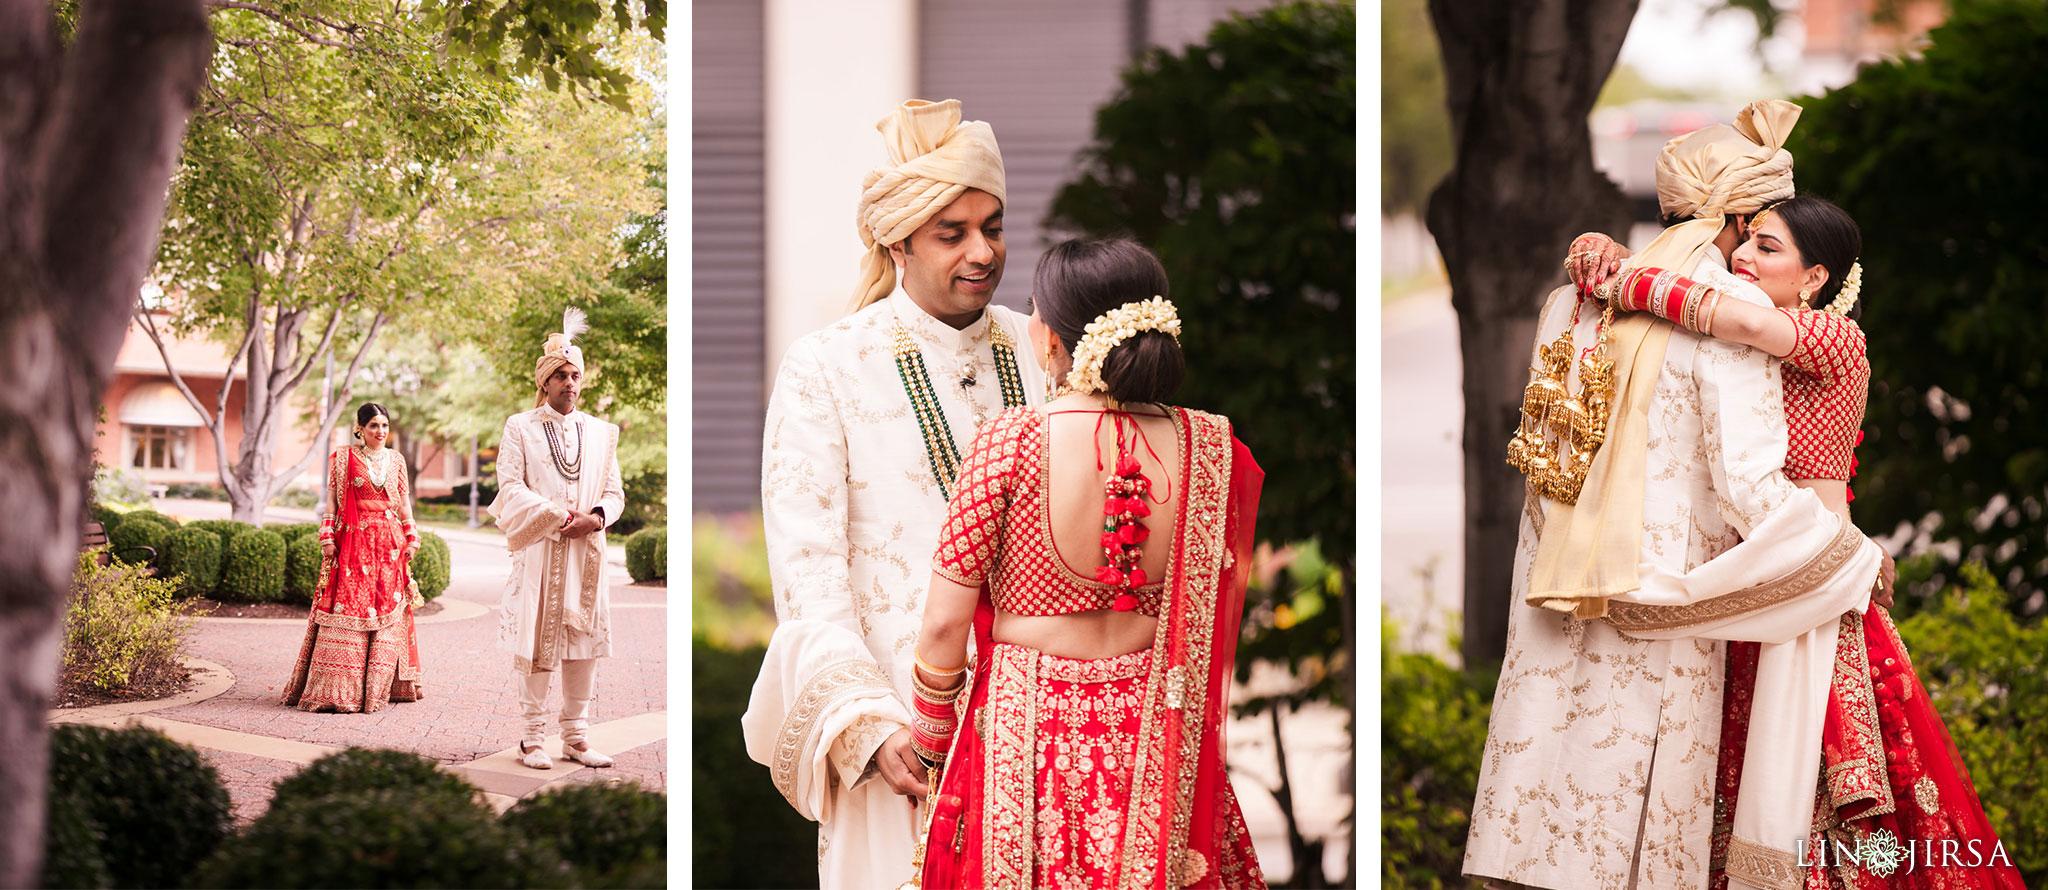 20 Ritz Carlton St Louis Missouri Indian Wedding Photography